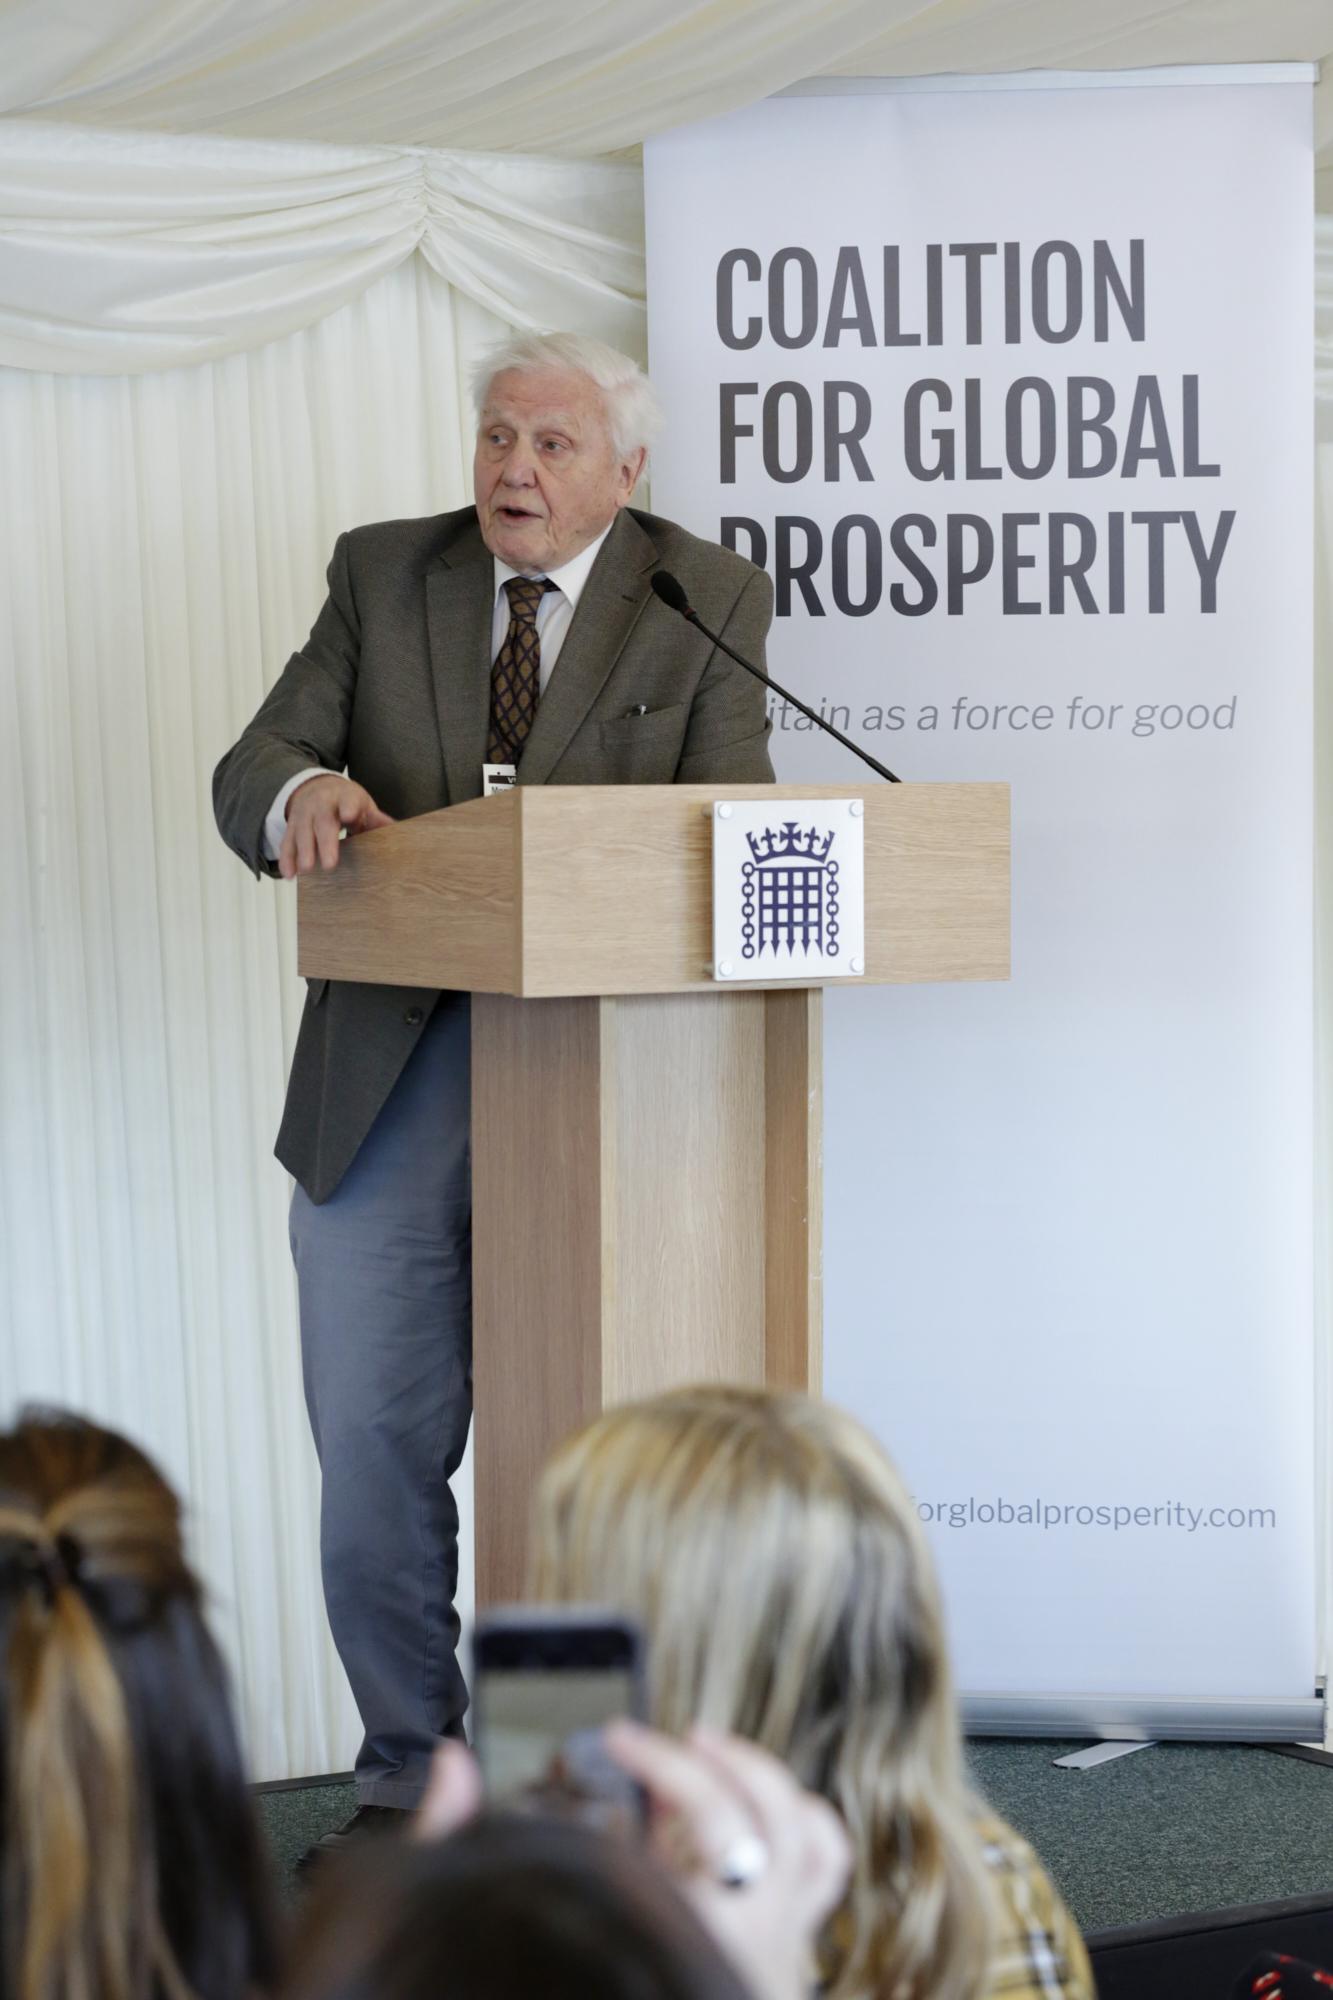 David Attenborough Speech